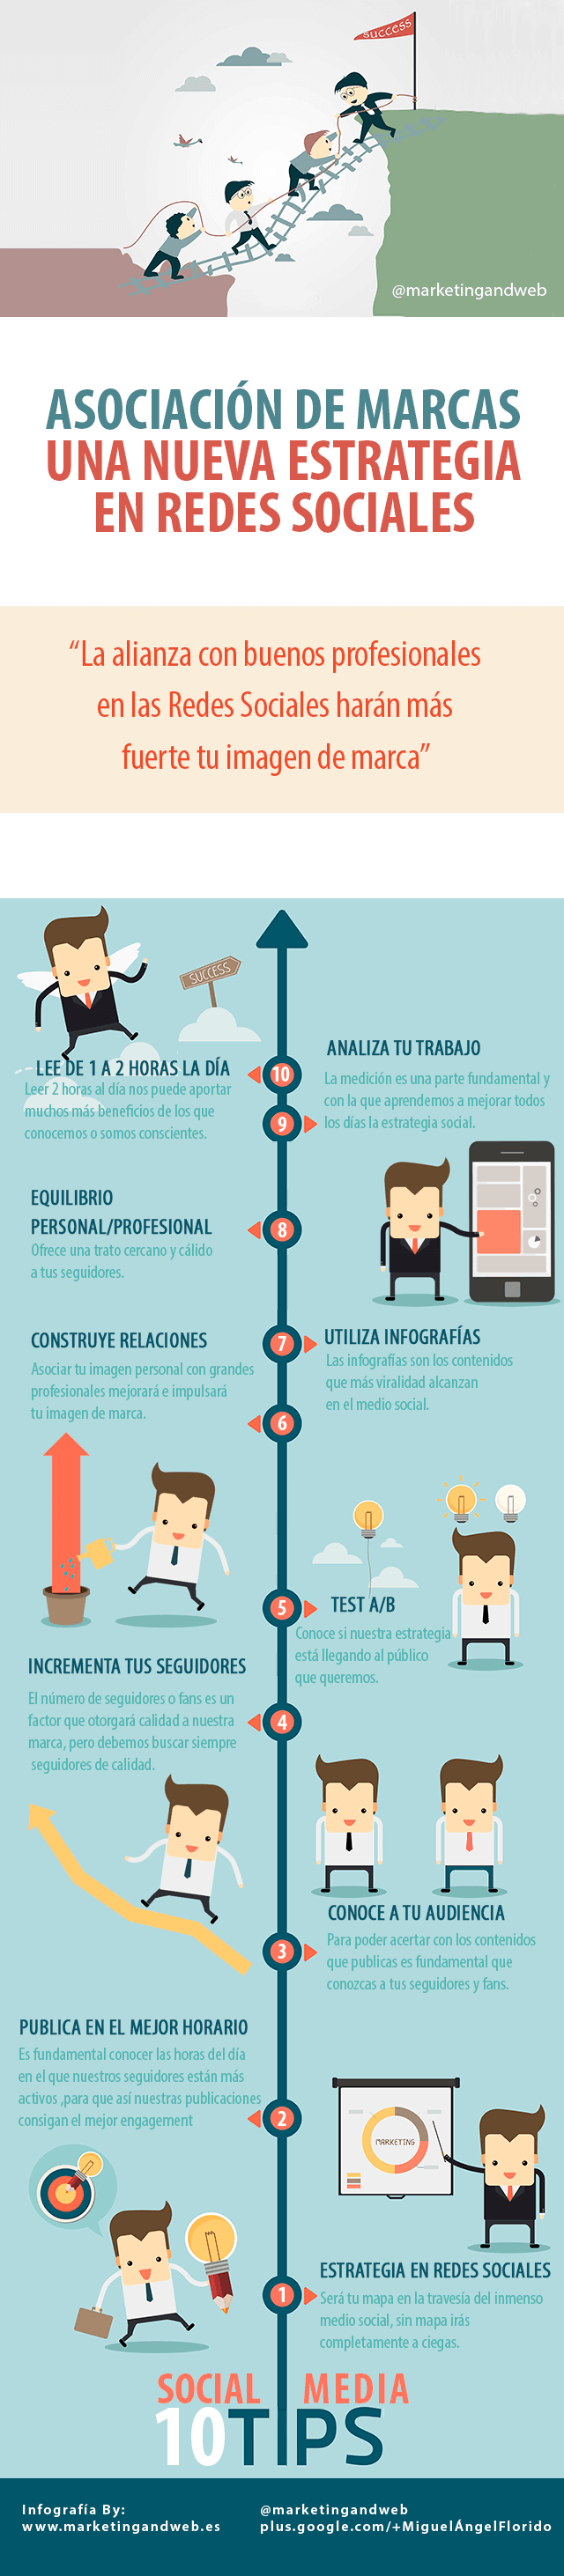 marketing en redes sociales infografia